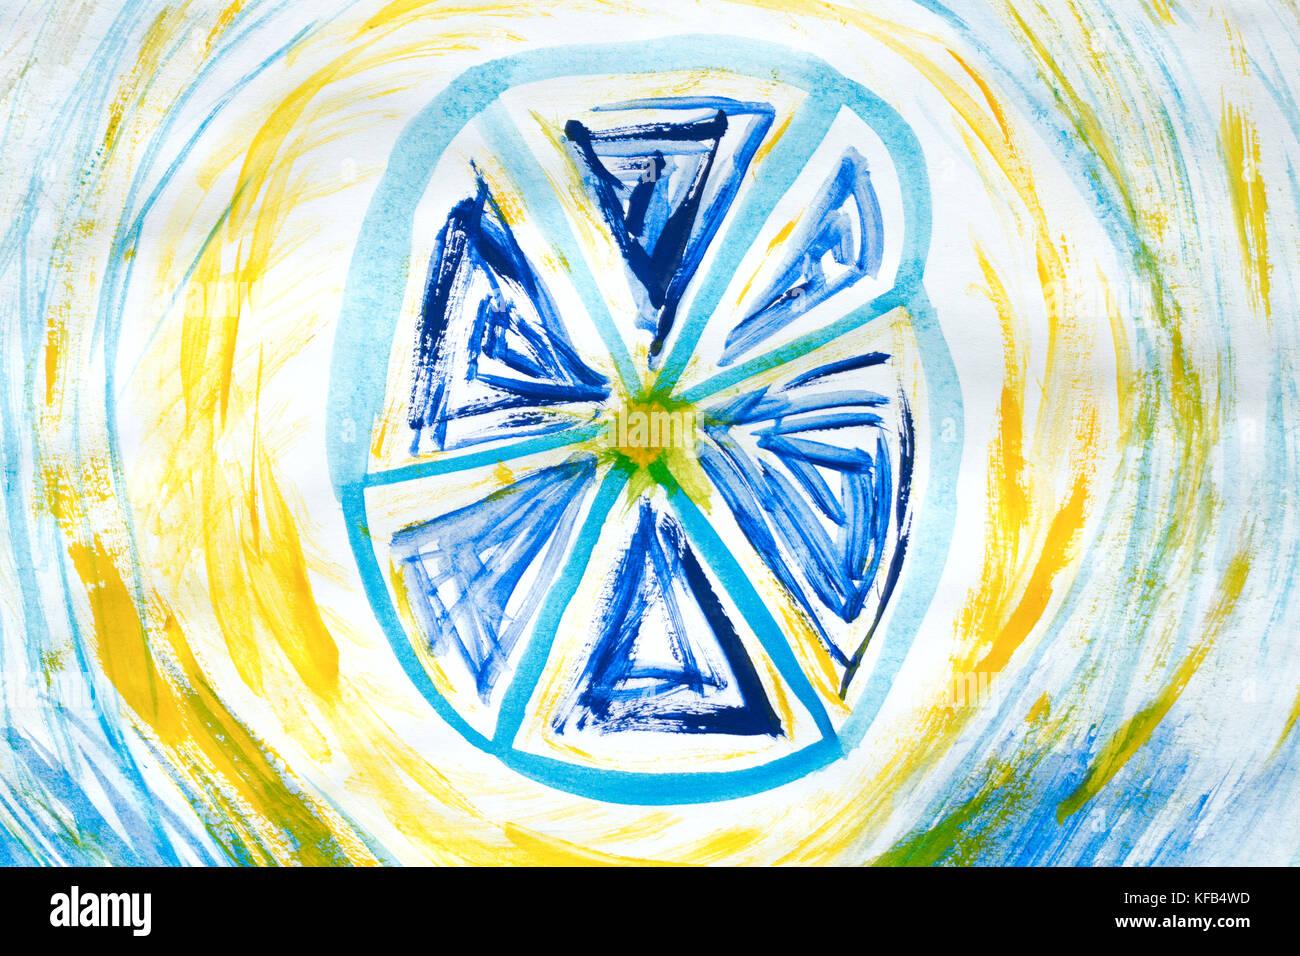 Resumen Antecedentes: pintura dibujada a mano patrones bluefloral ...